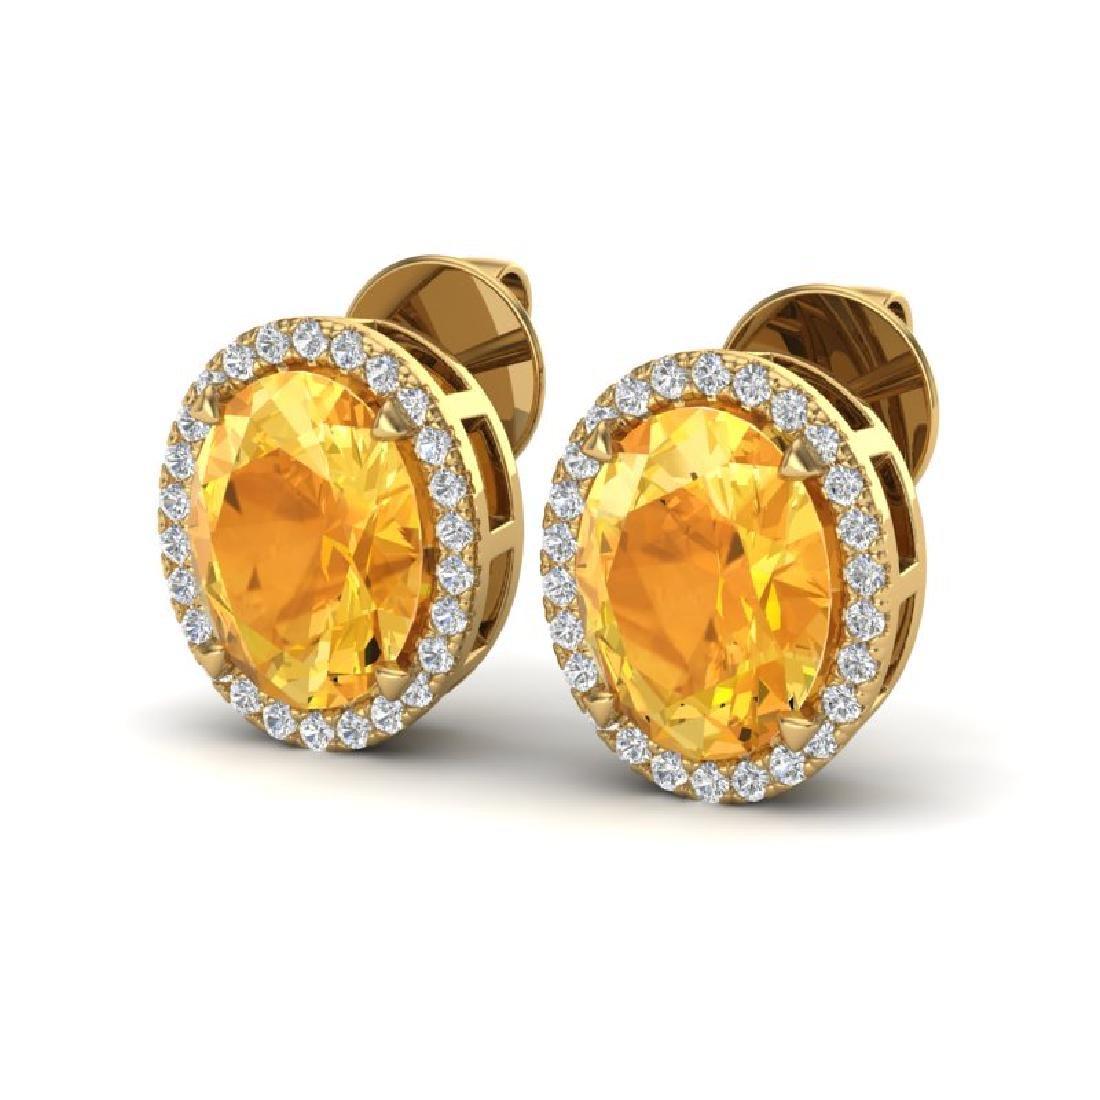 5.50 CTW Citrine & Micro VS/SI Diamond Halo Earrings